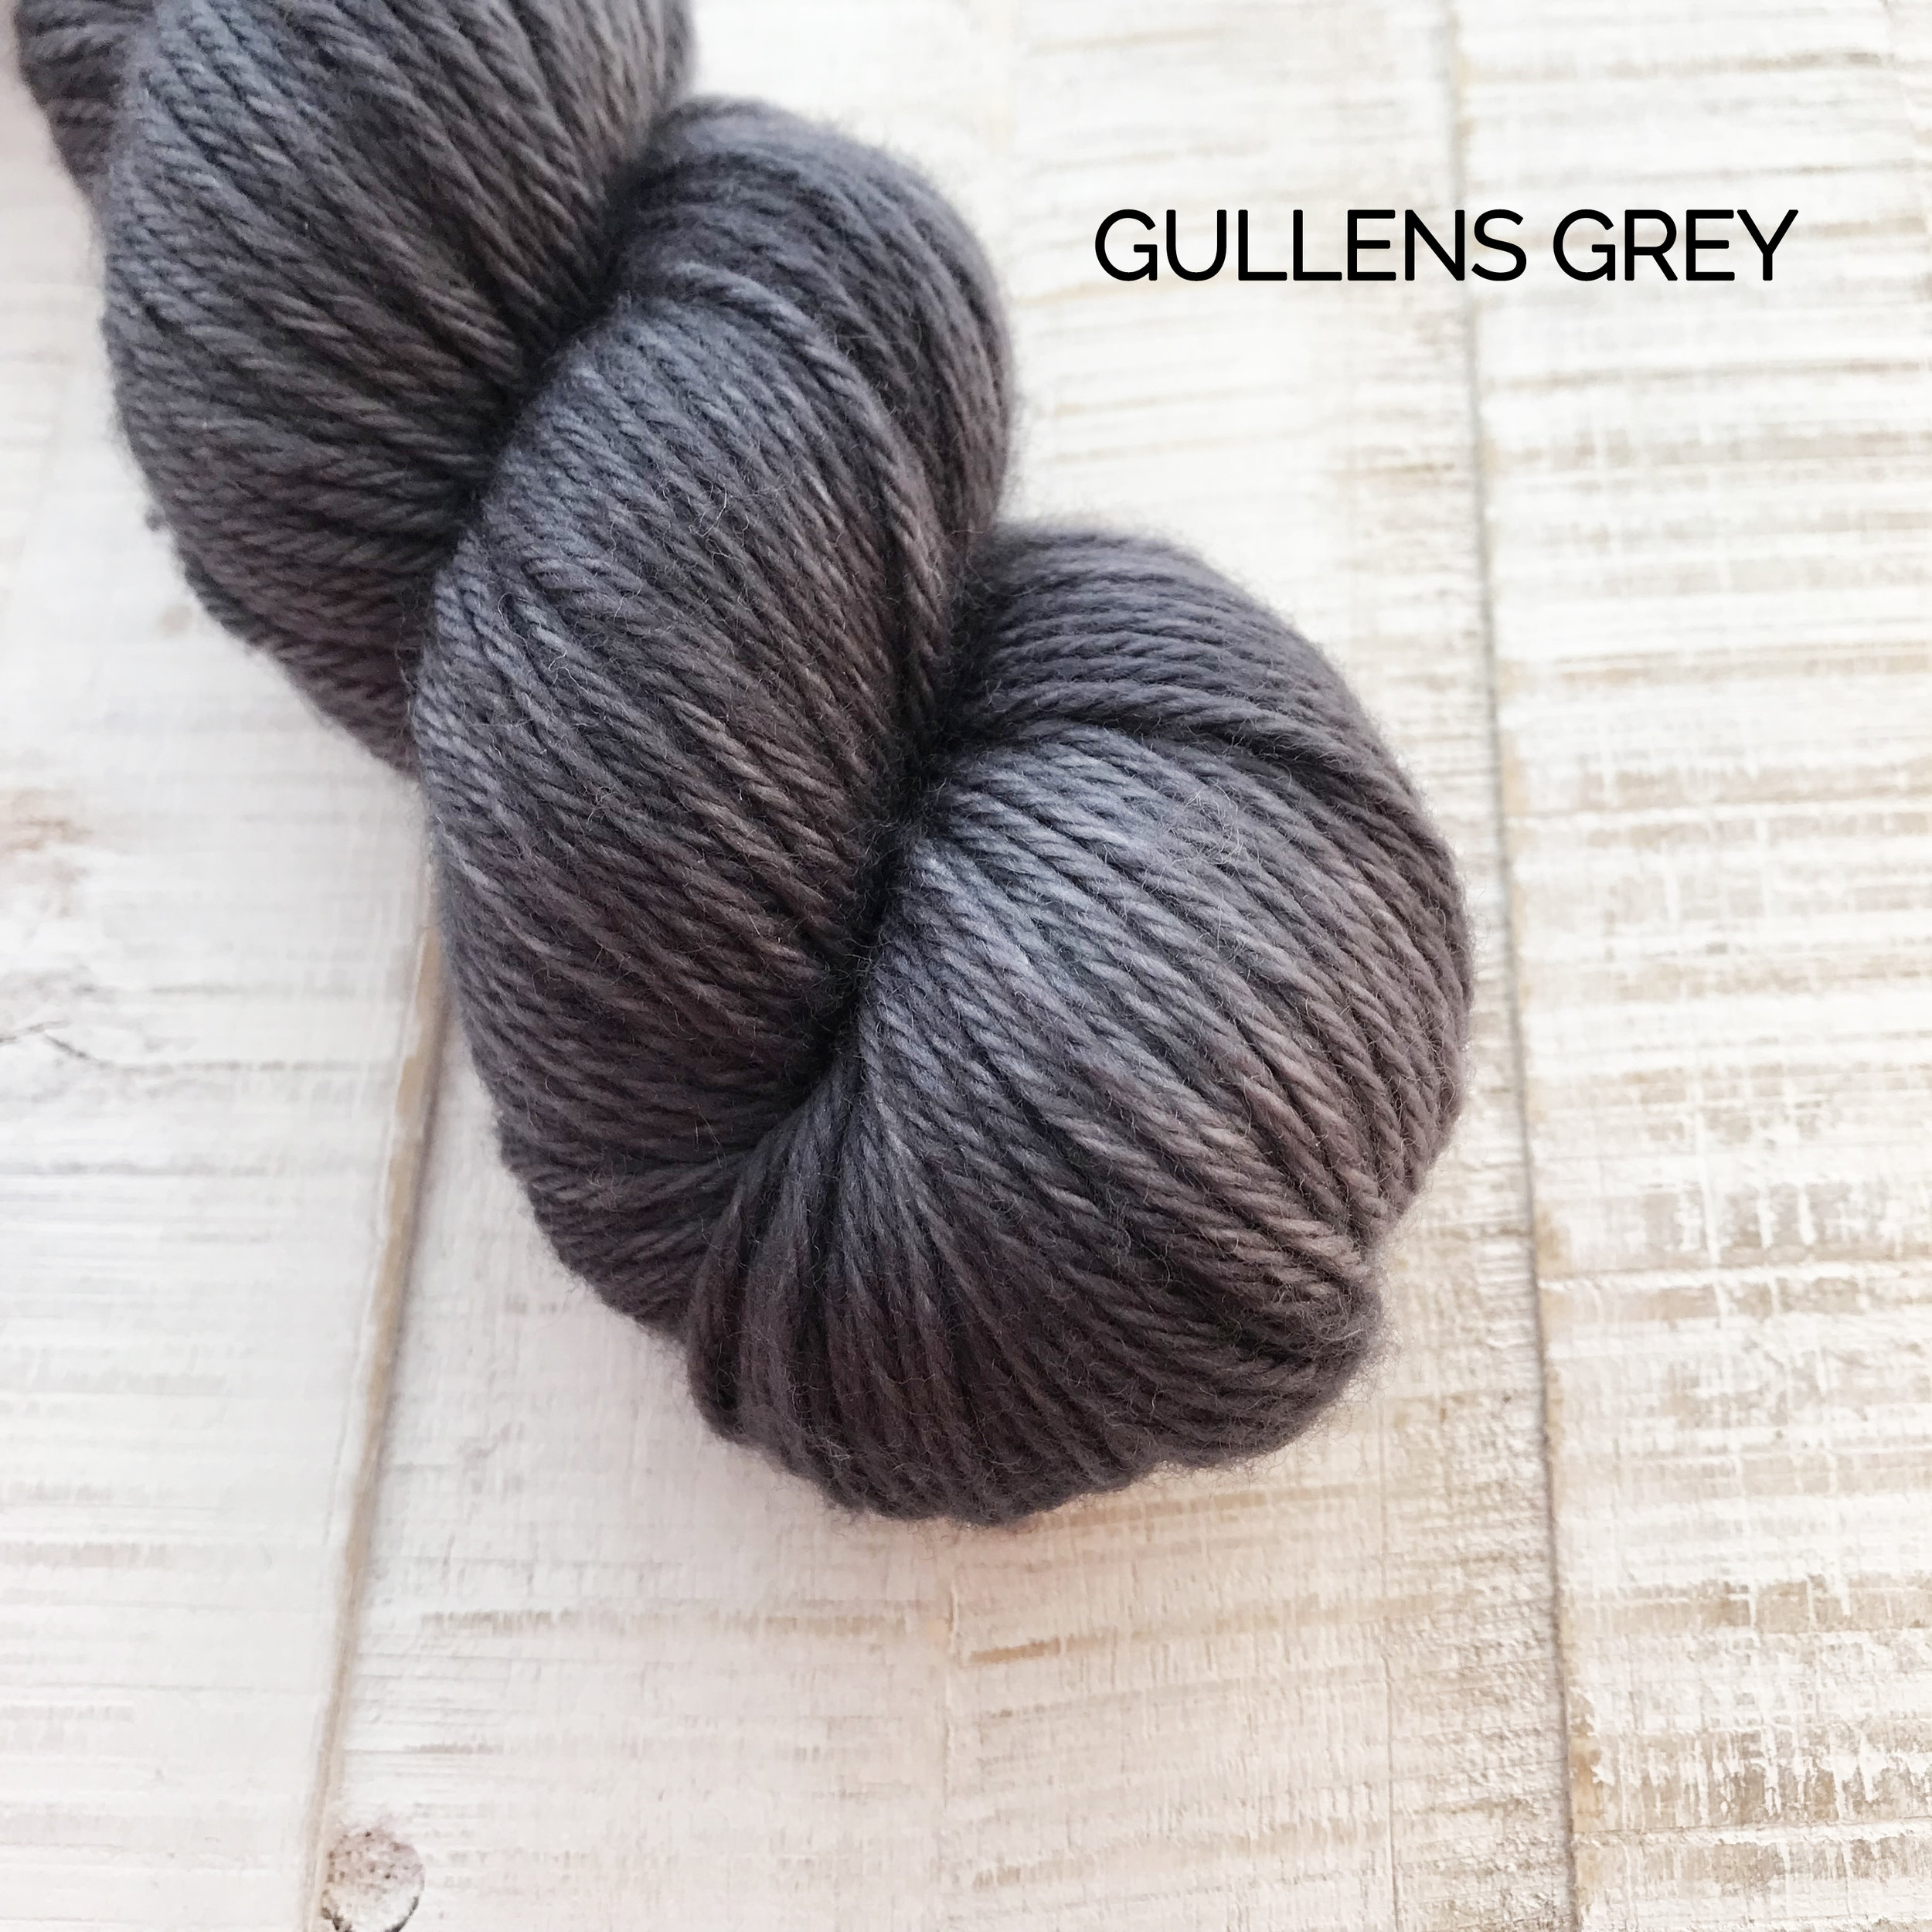 GULLENS GREY DK.jpg